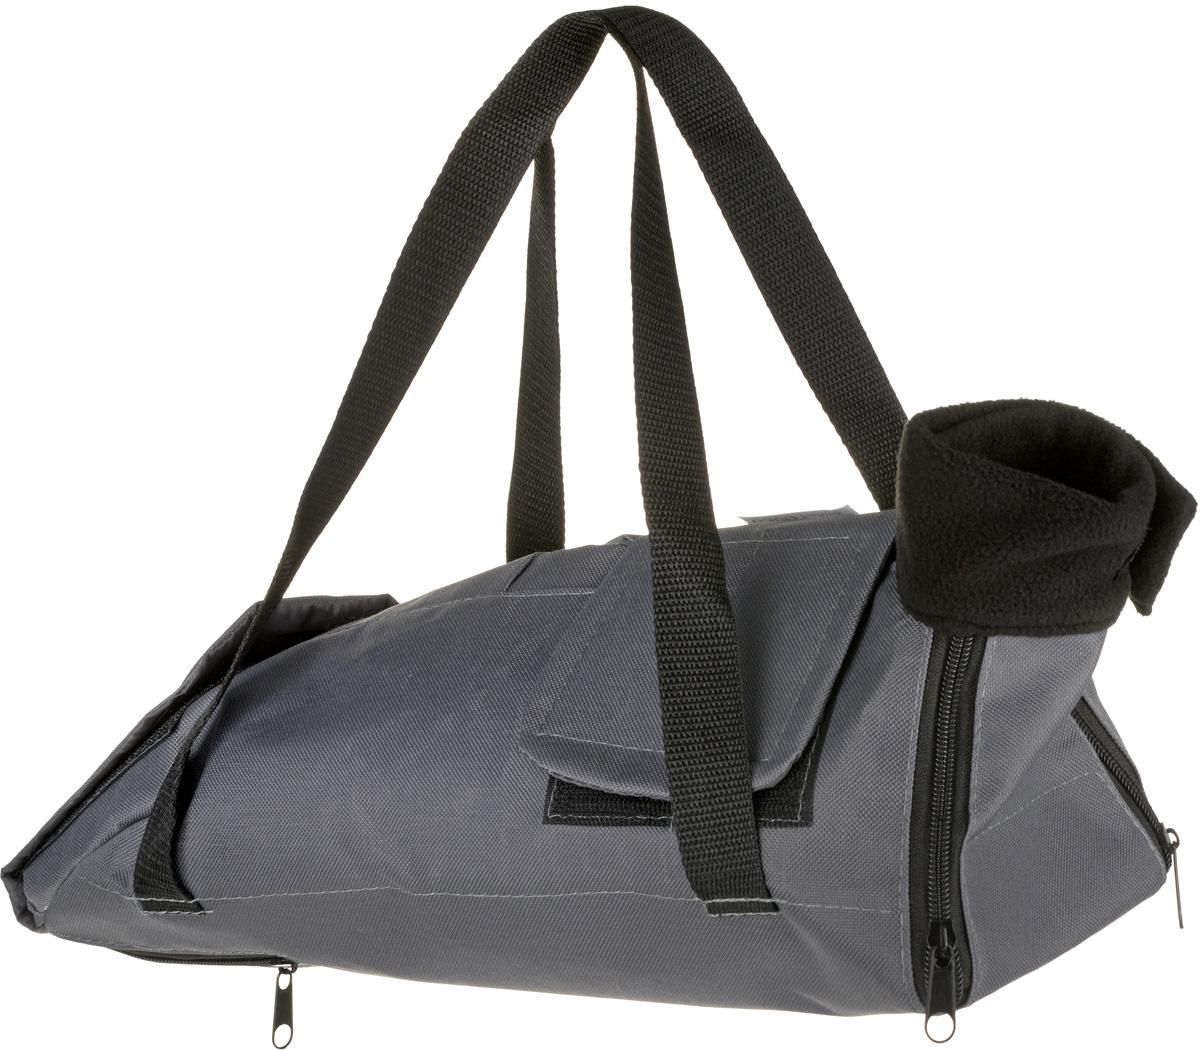 Сумка-фиксатор для кошек OSSO Fashion, цвет: серый. Размер S цена